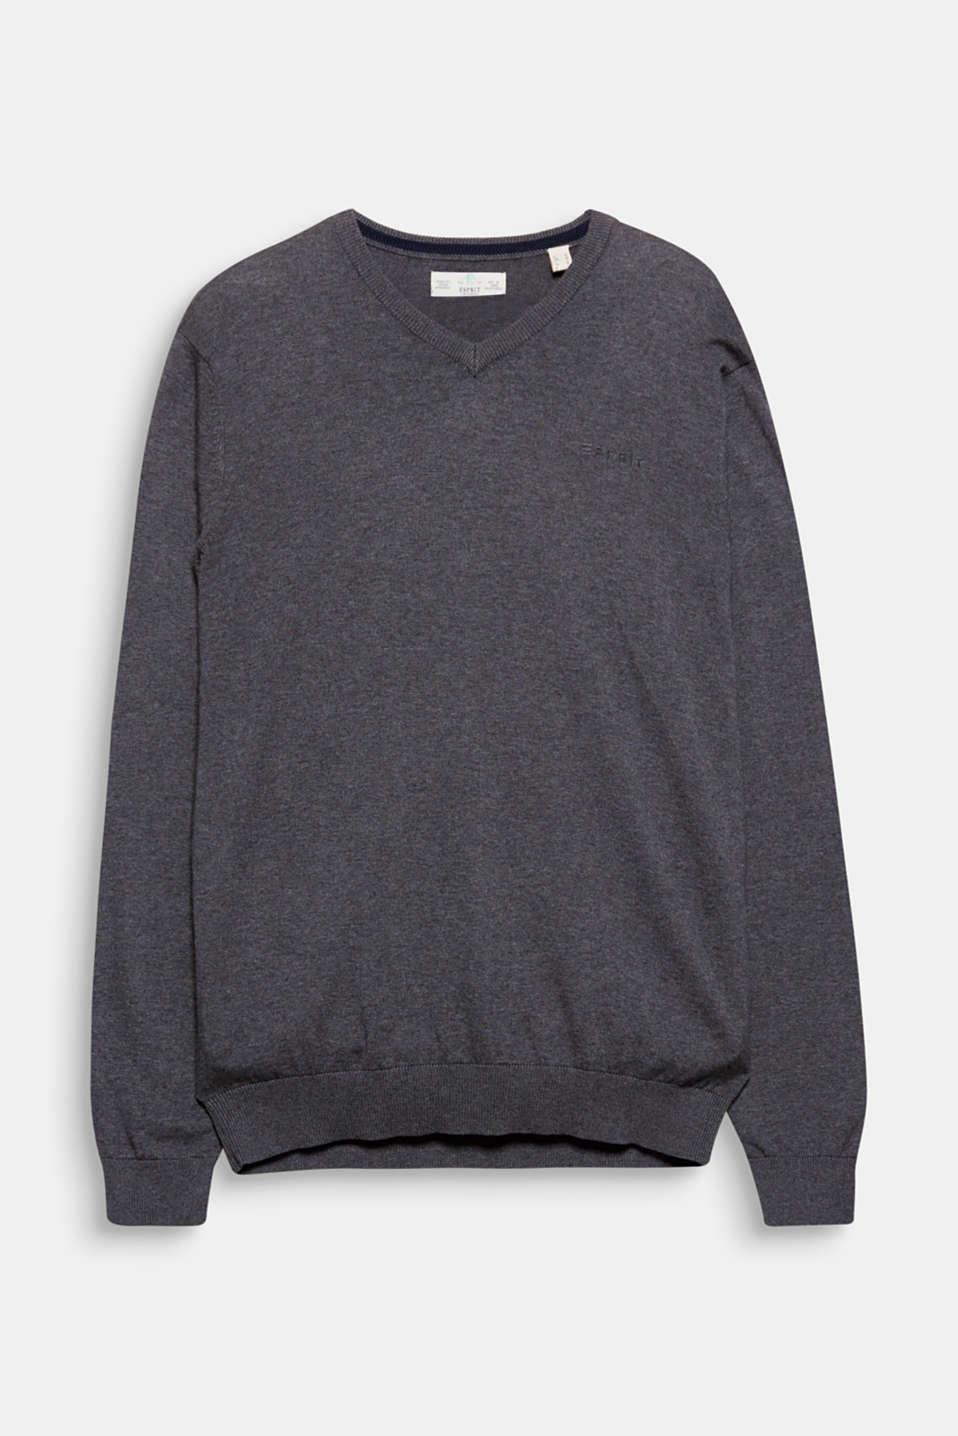 Esprit Basic V Neck Pulli, 100% Baumwolle im Online Shop